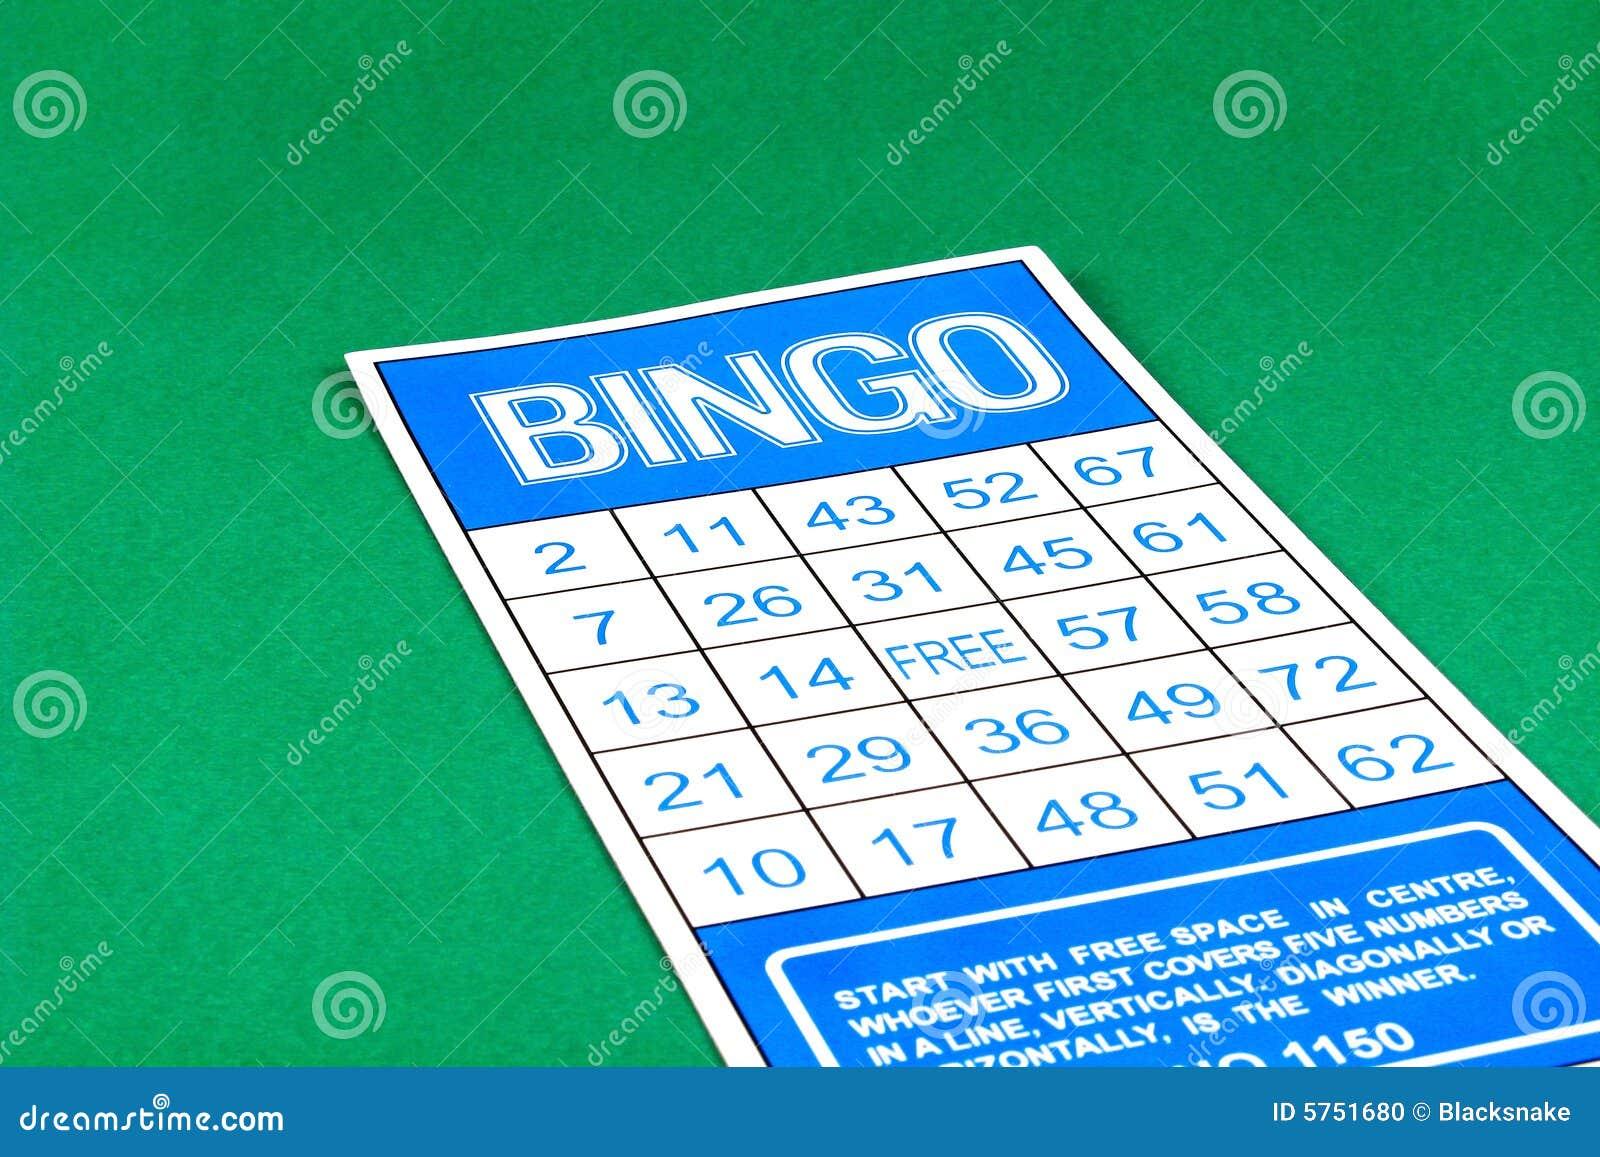 bingo based casinos